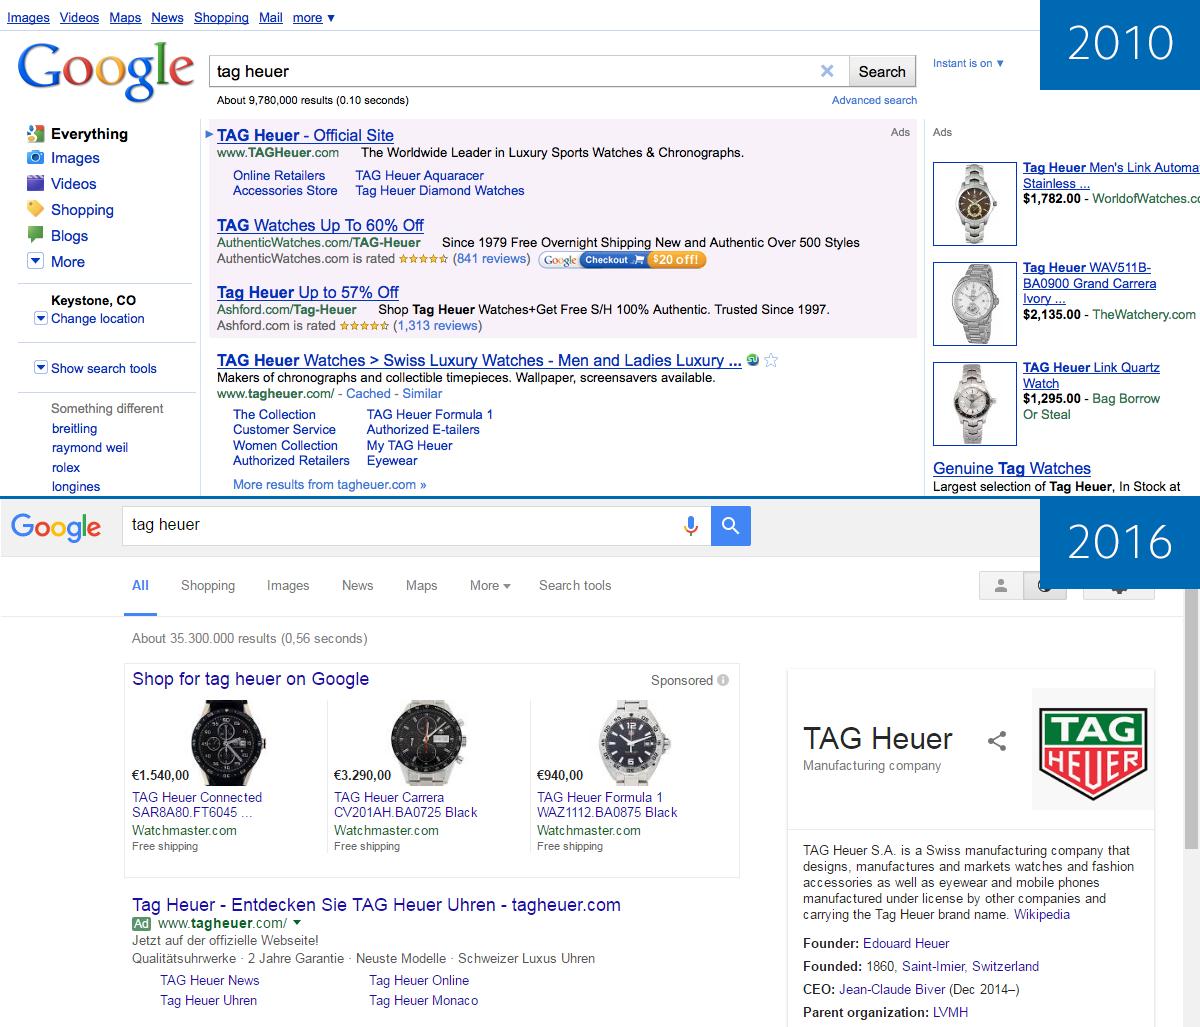 Google search interface 2010 vs 2016